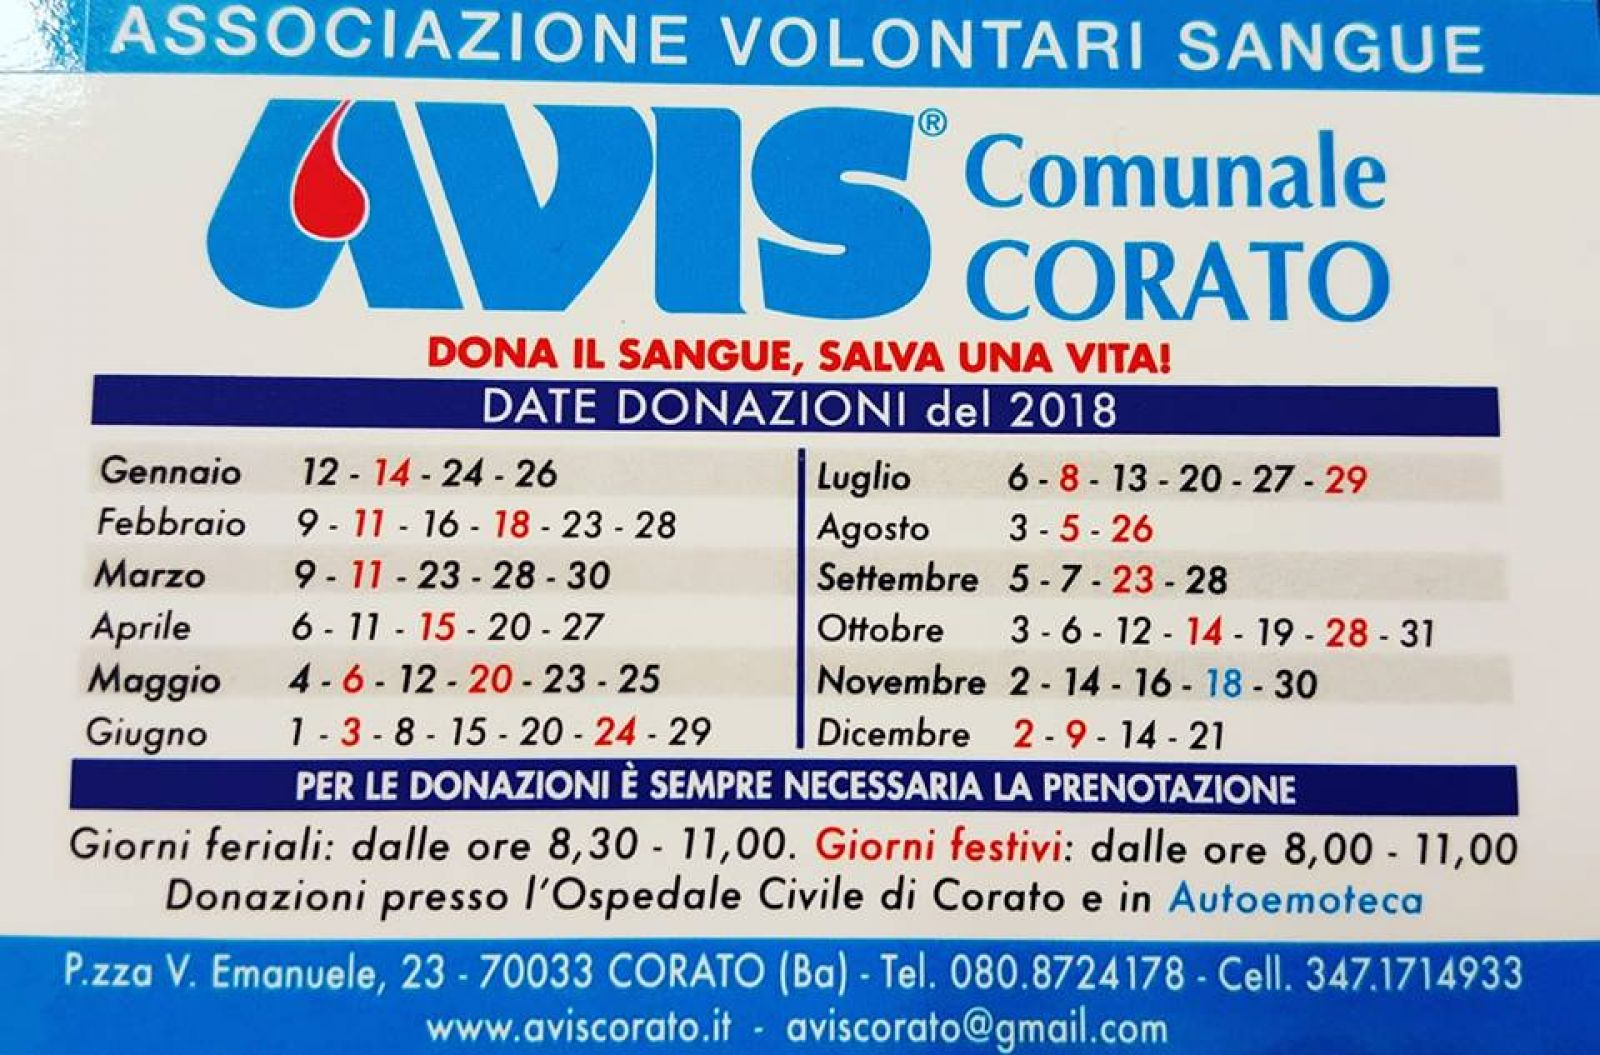 Calendario Avis.Calendario Donazioni 2018 Avis Corato